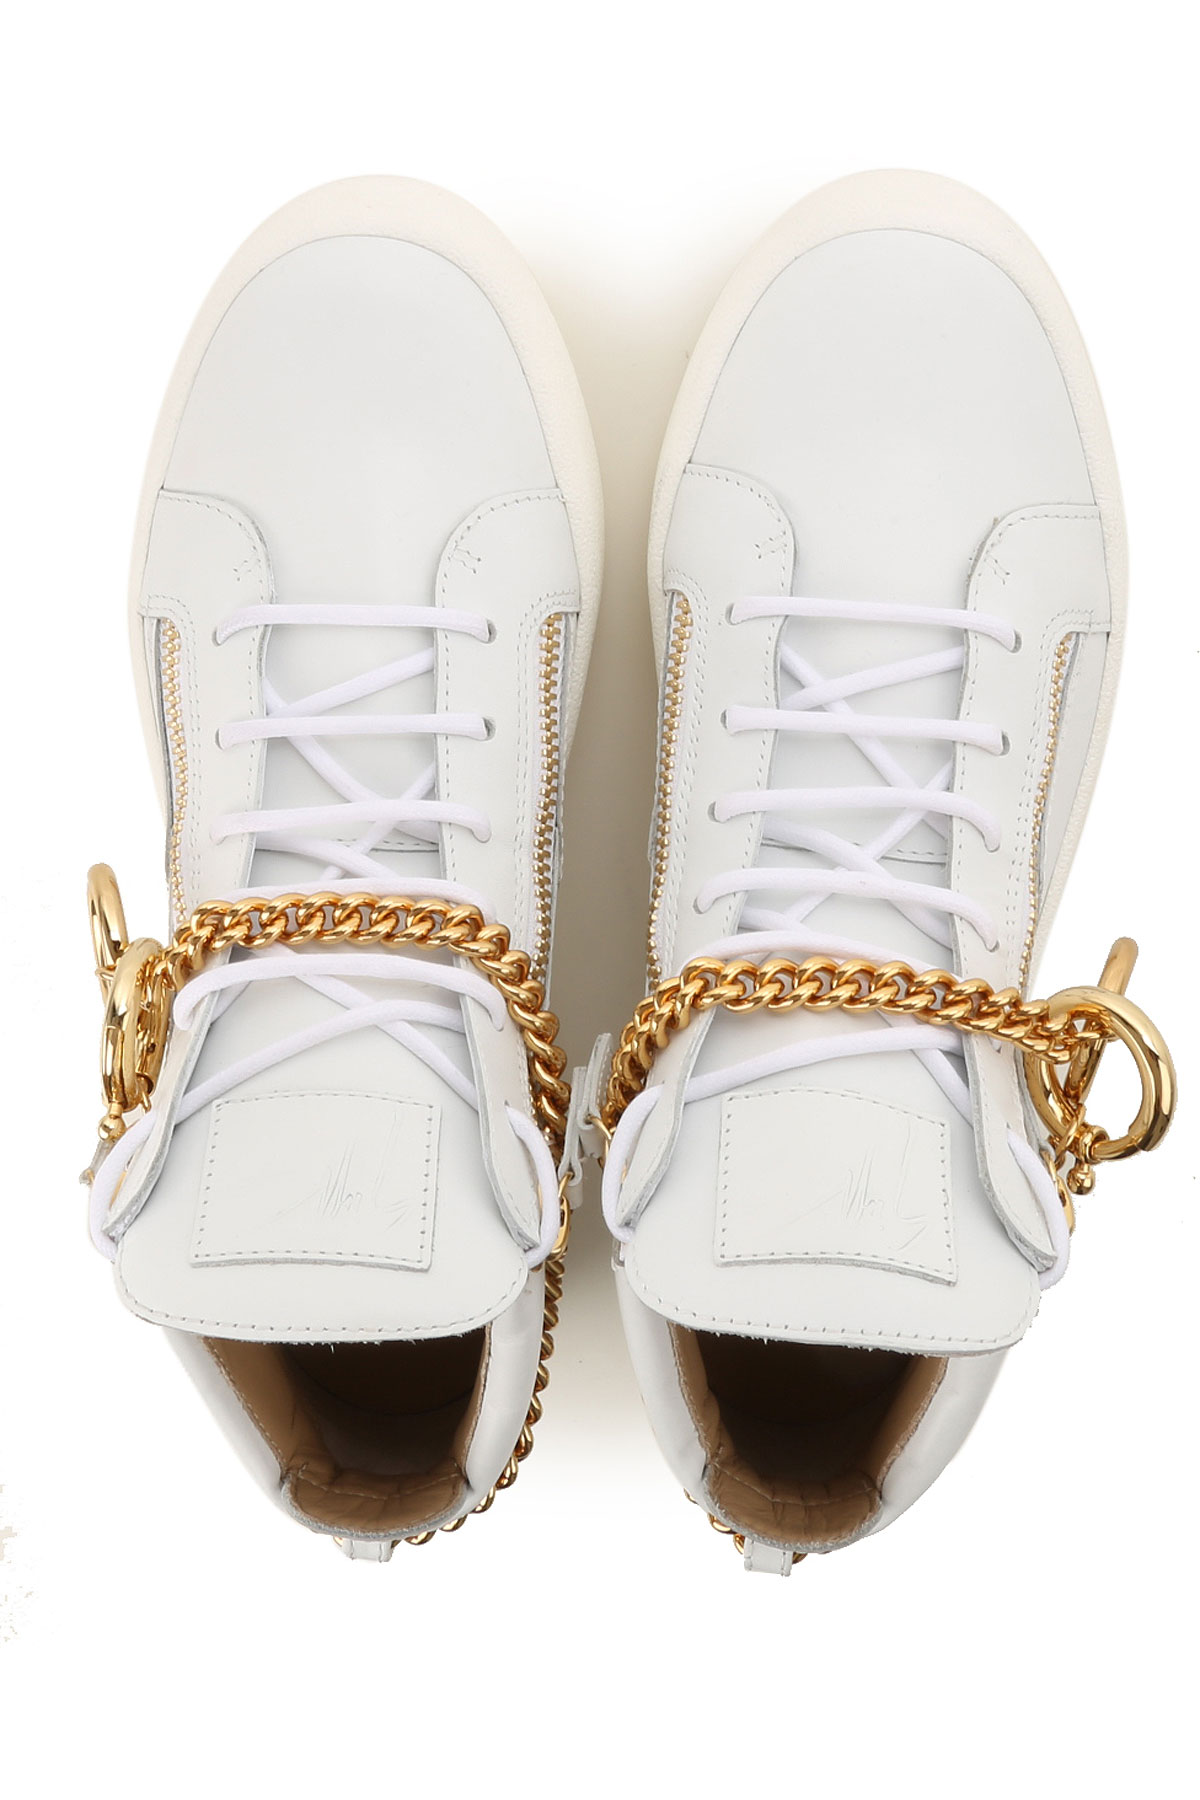 Oro Zapatos Zanotti Hombres Giuseppe dorado Primavera Blanco Para verano 2019 8UpFqw